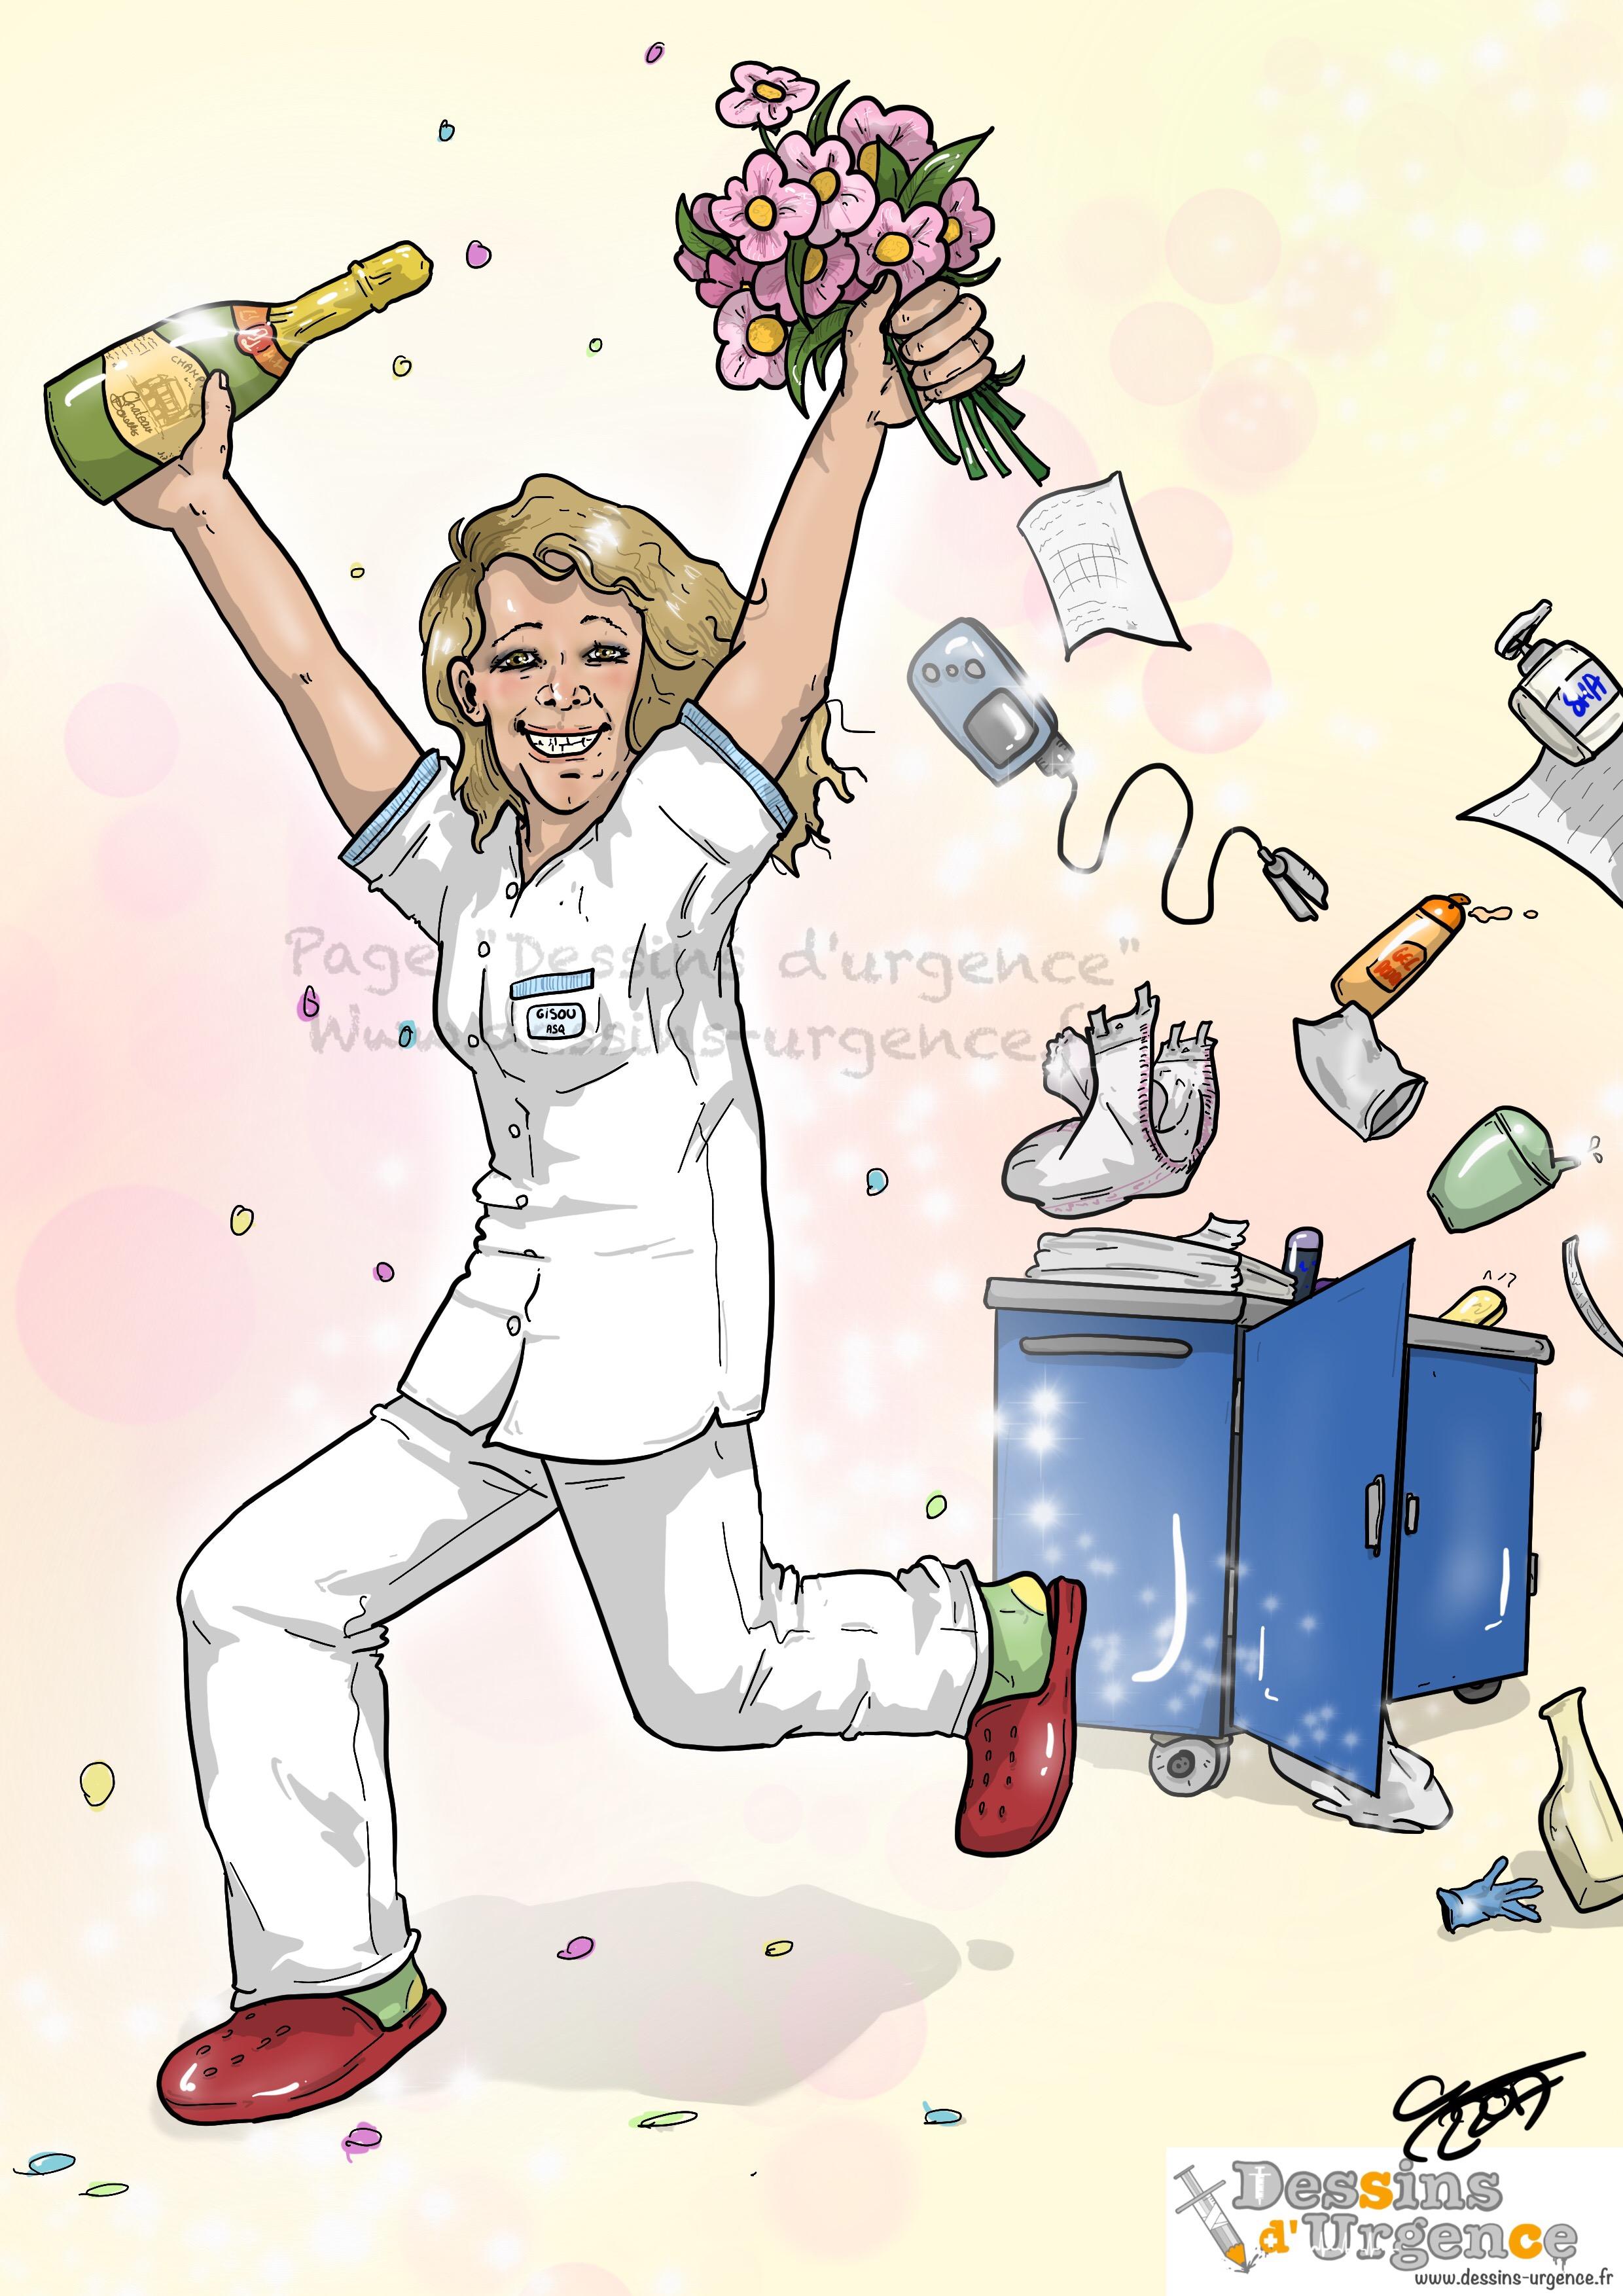 Vid o du tv d part de gisou dessins d 39 urgence - Dessin infirmiere humoristique ...